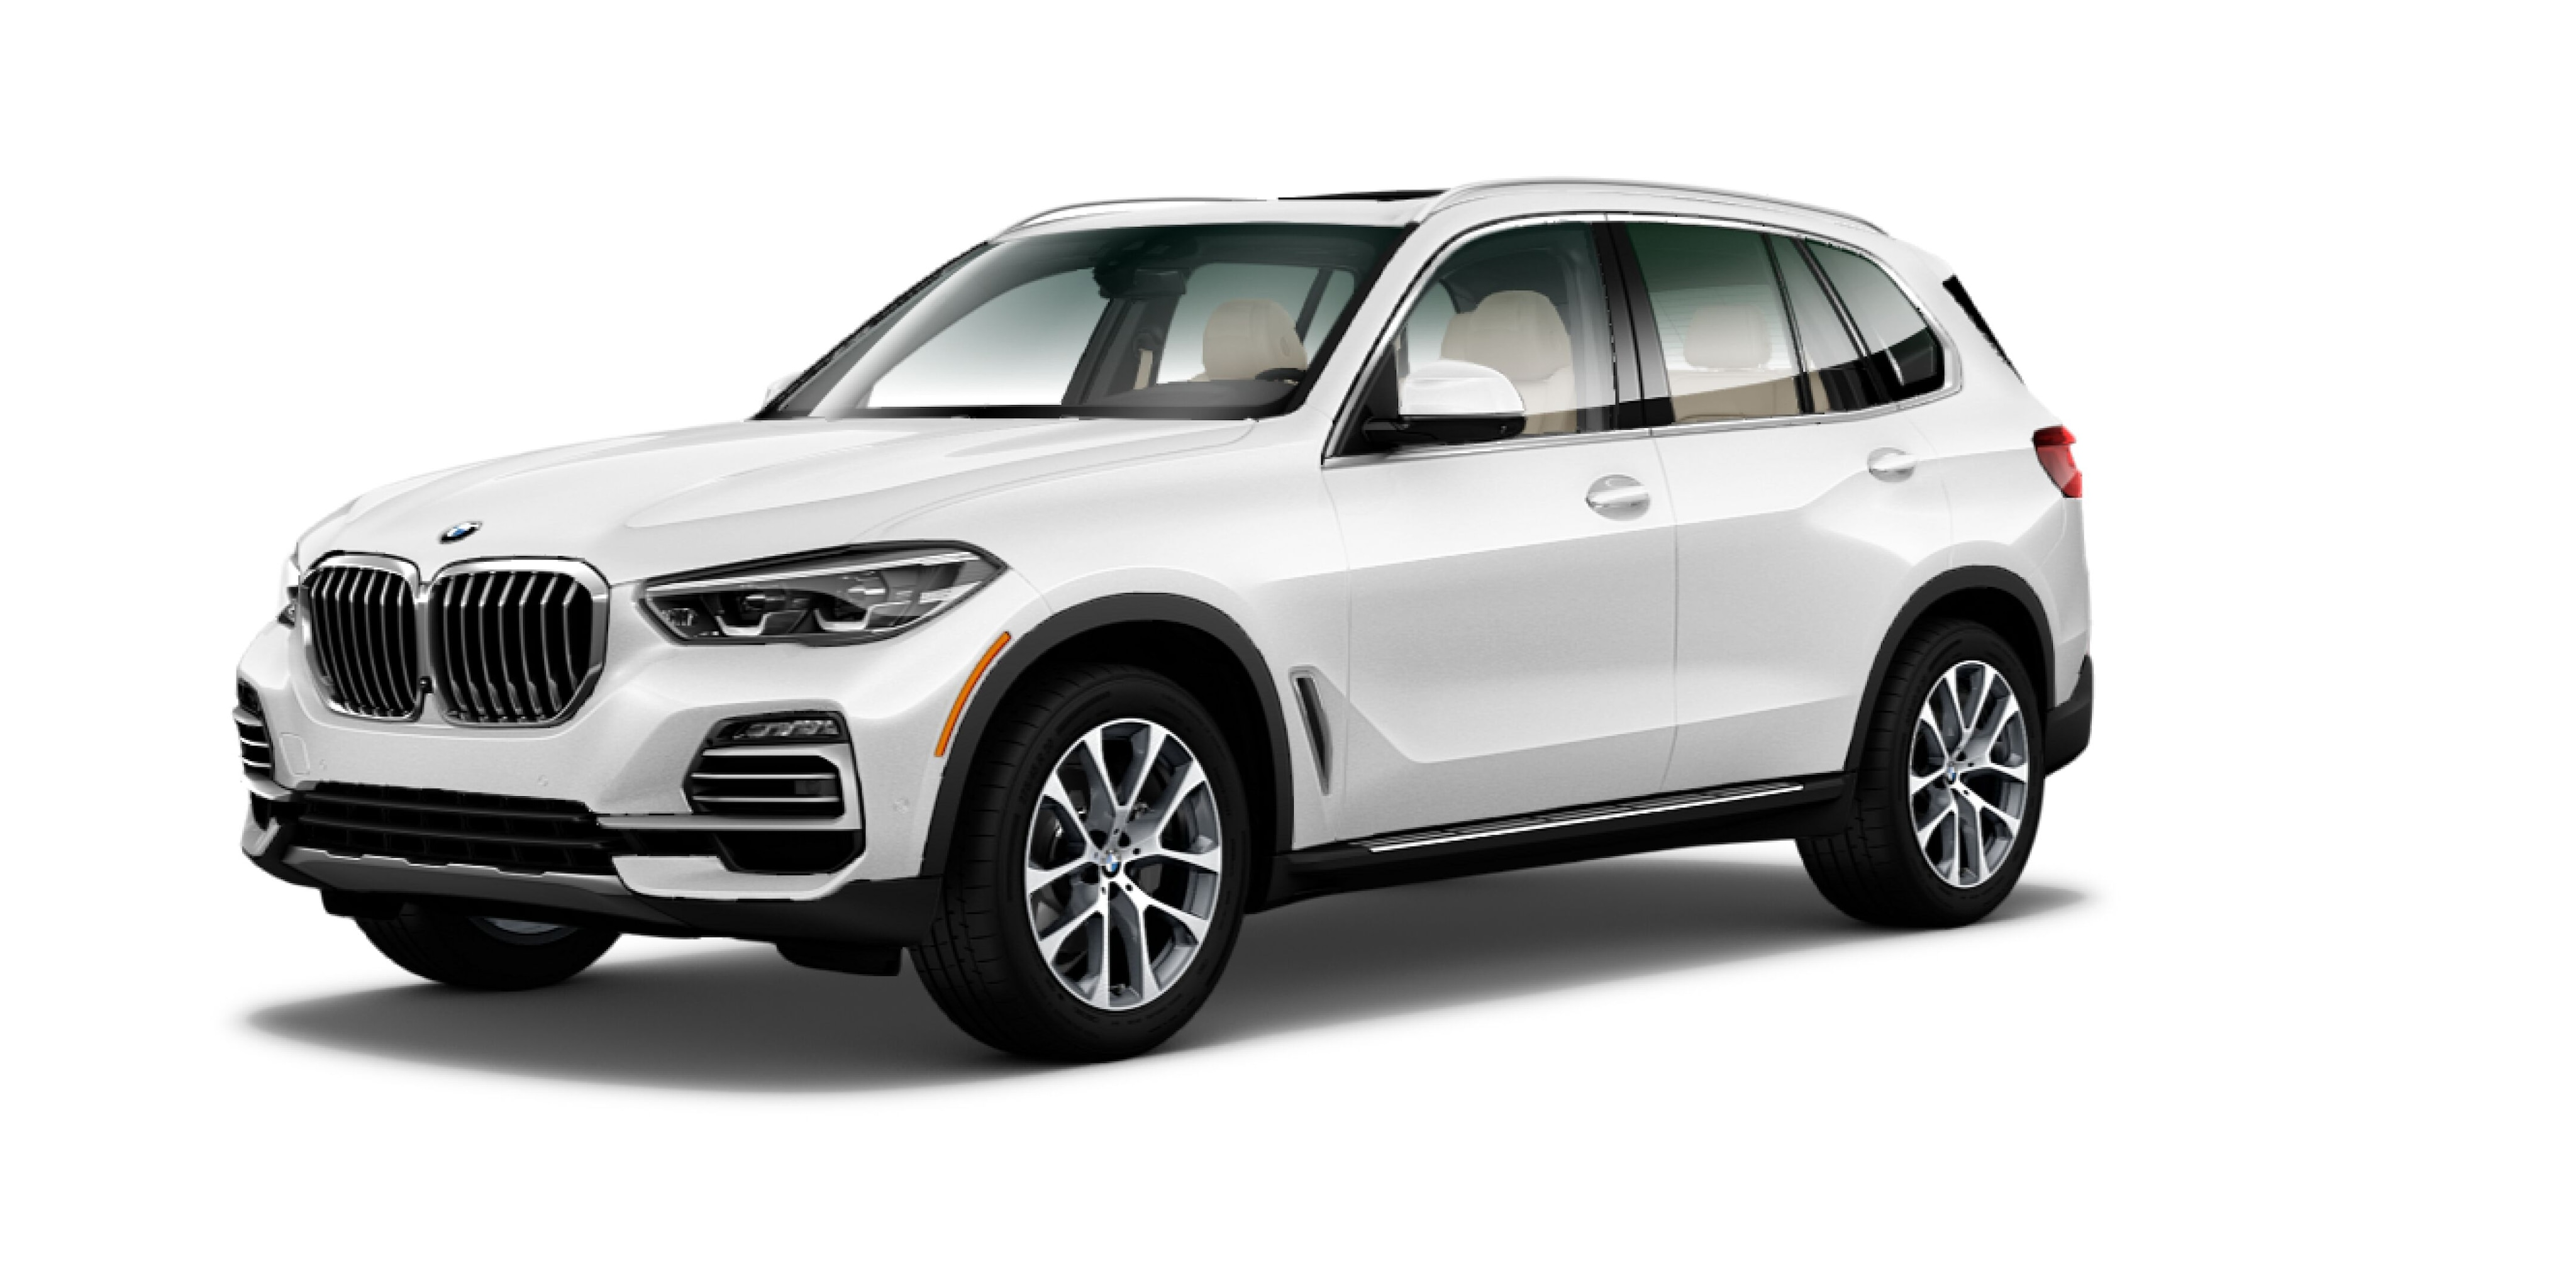 2020 BMW X5 SUV